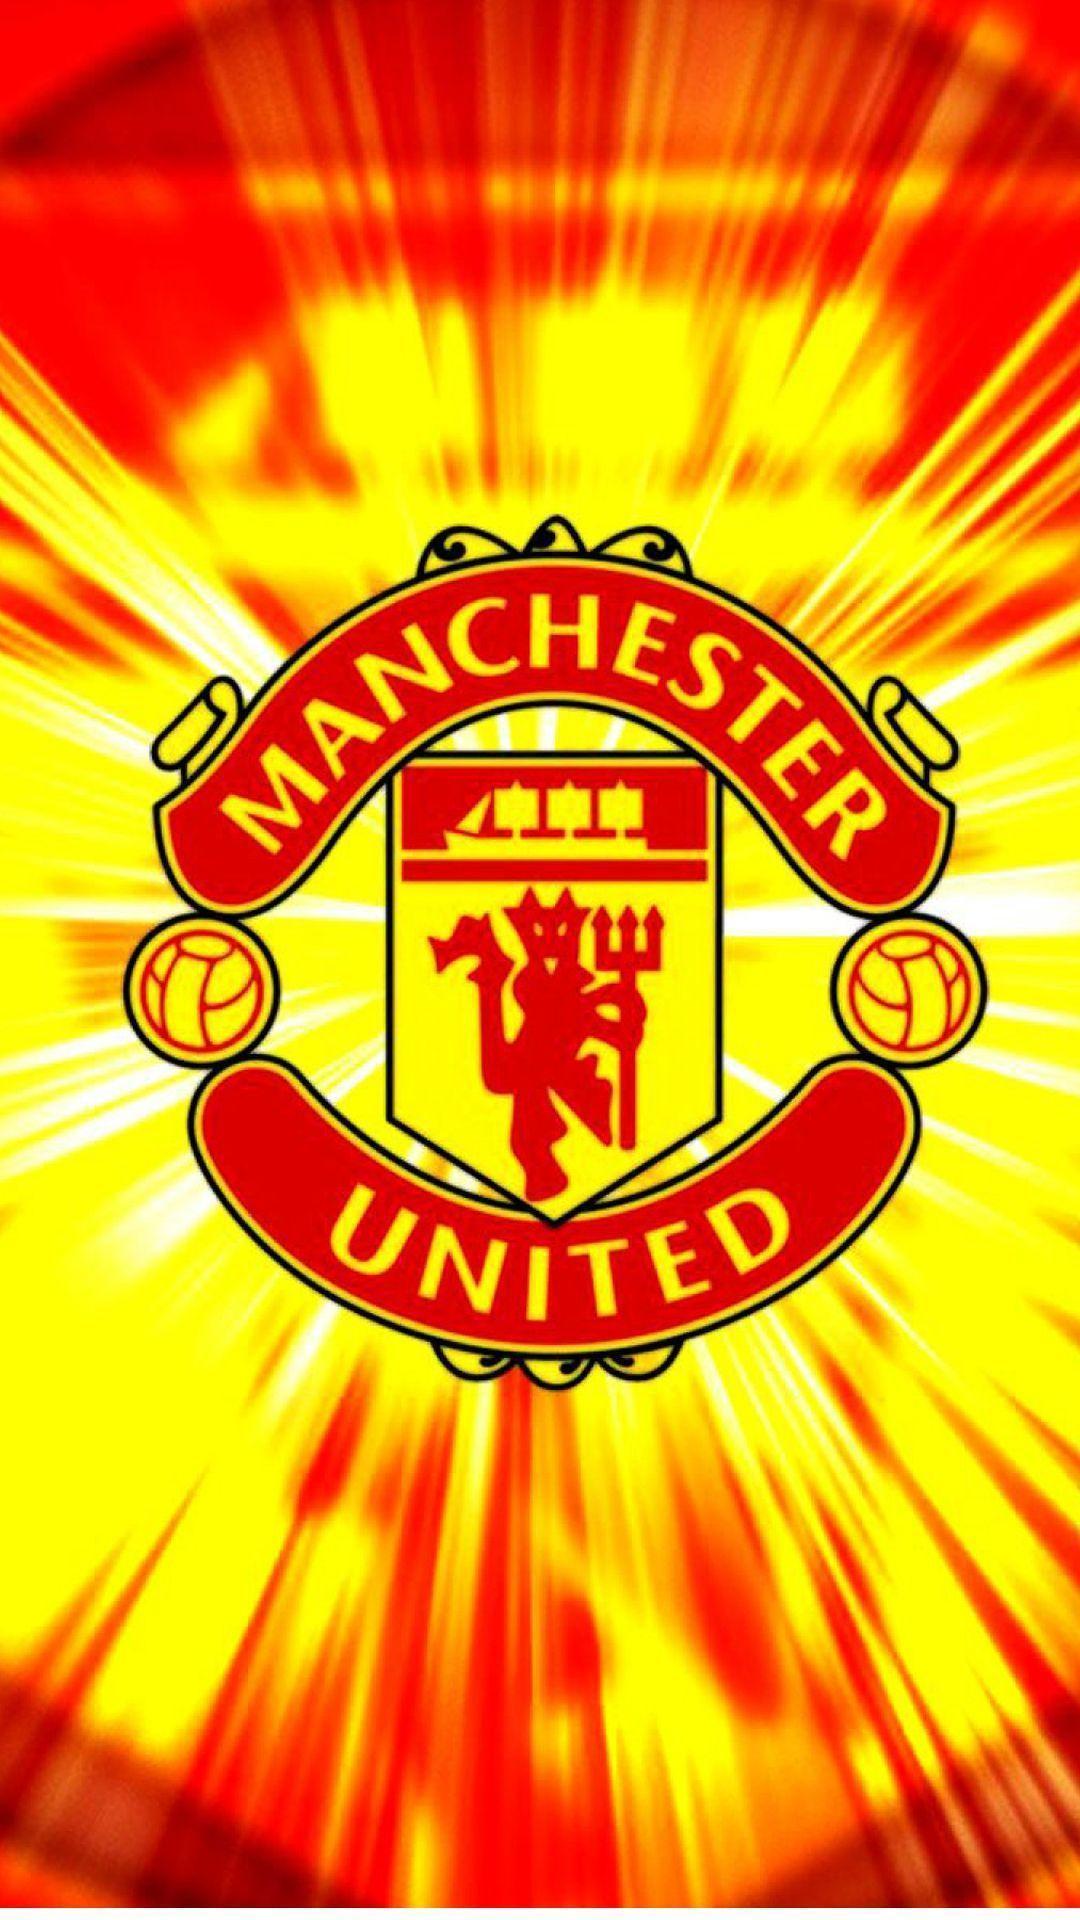 Wallpapers Logo Manchester United Terbaru 2017 - Wallpaper ...